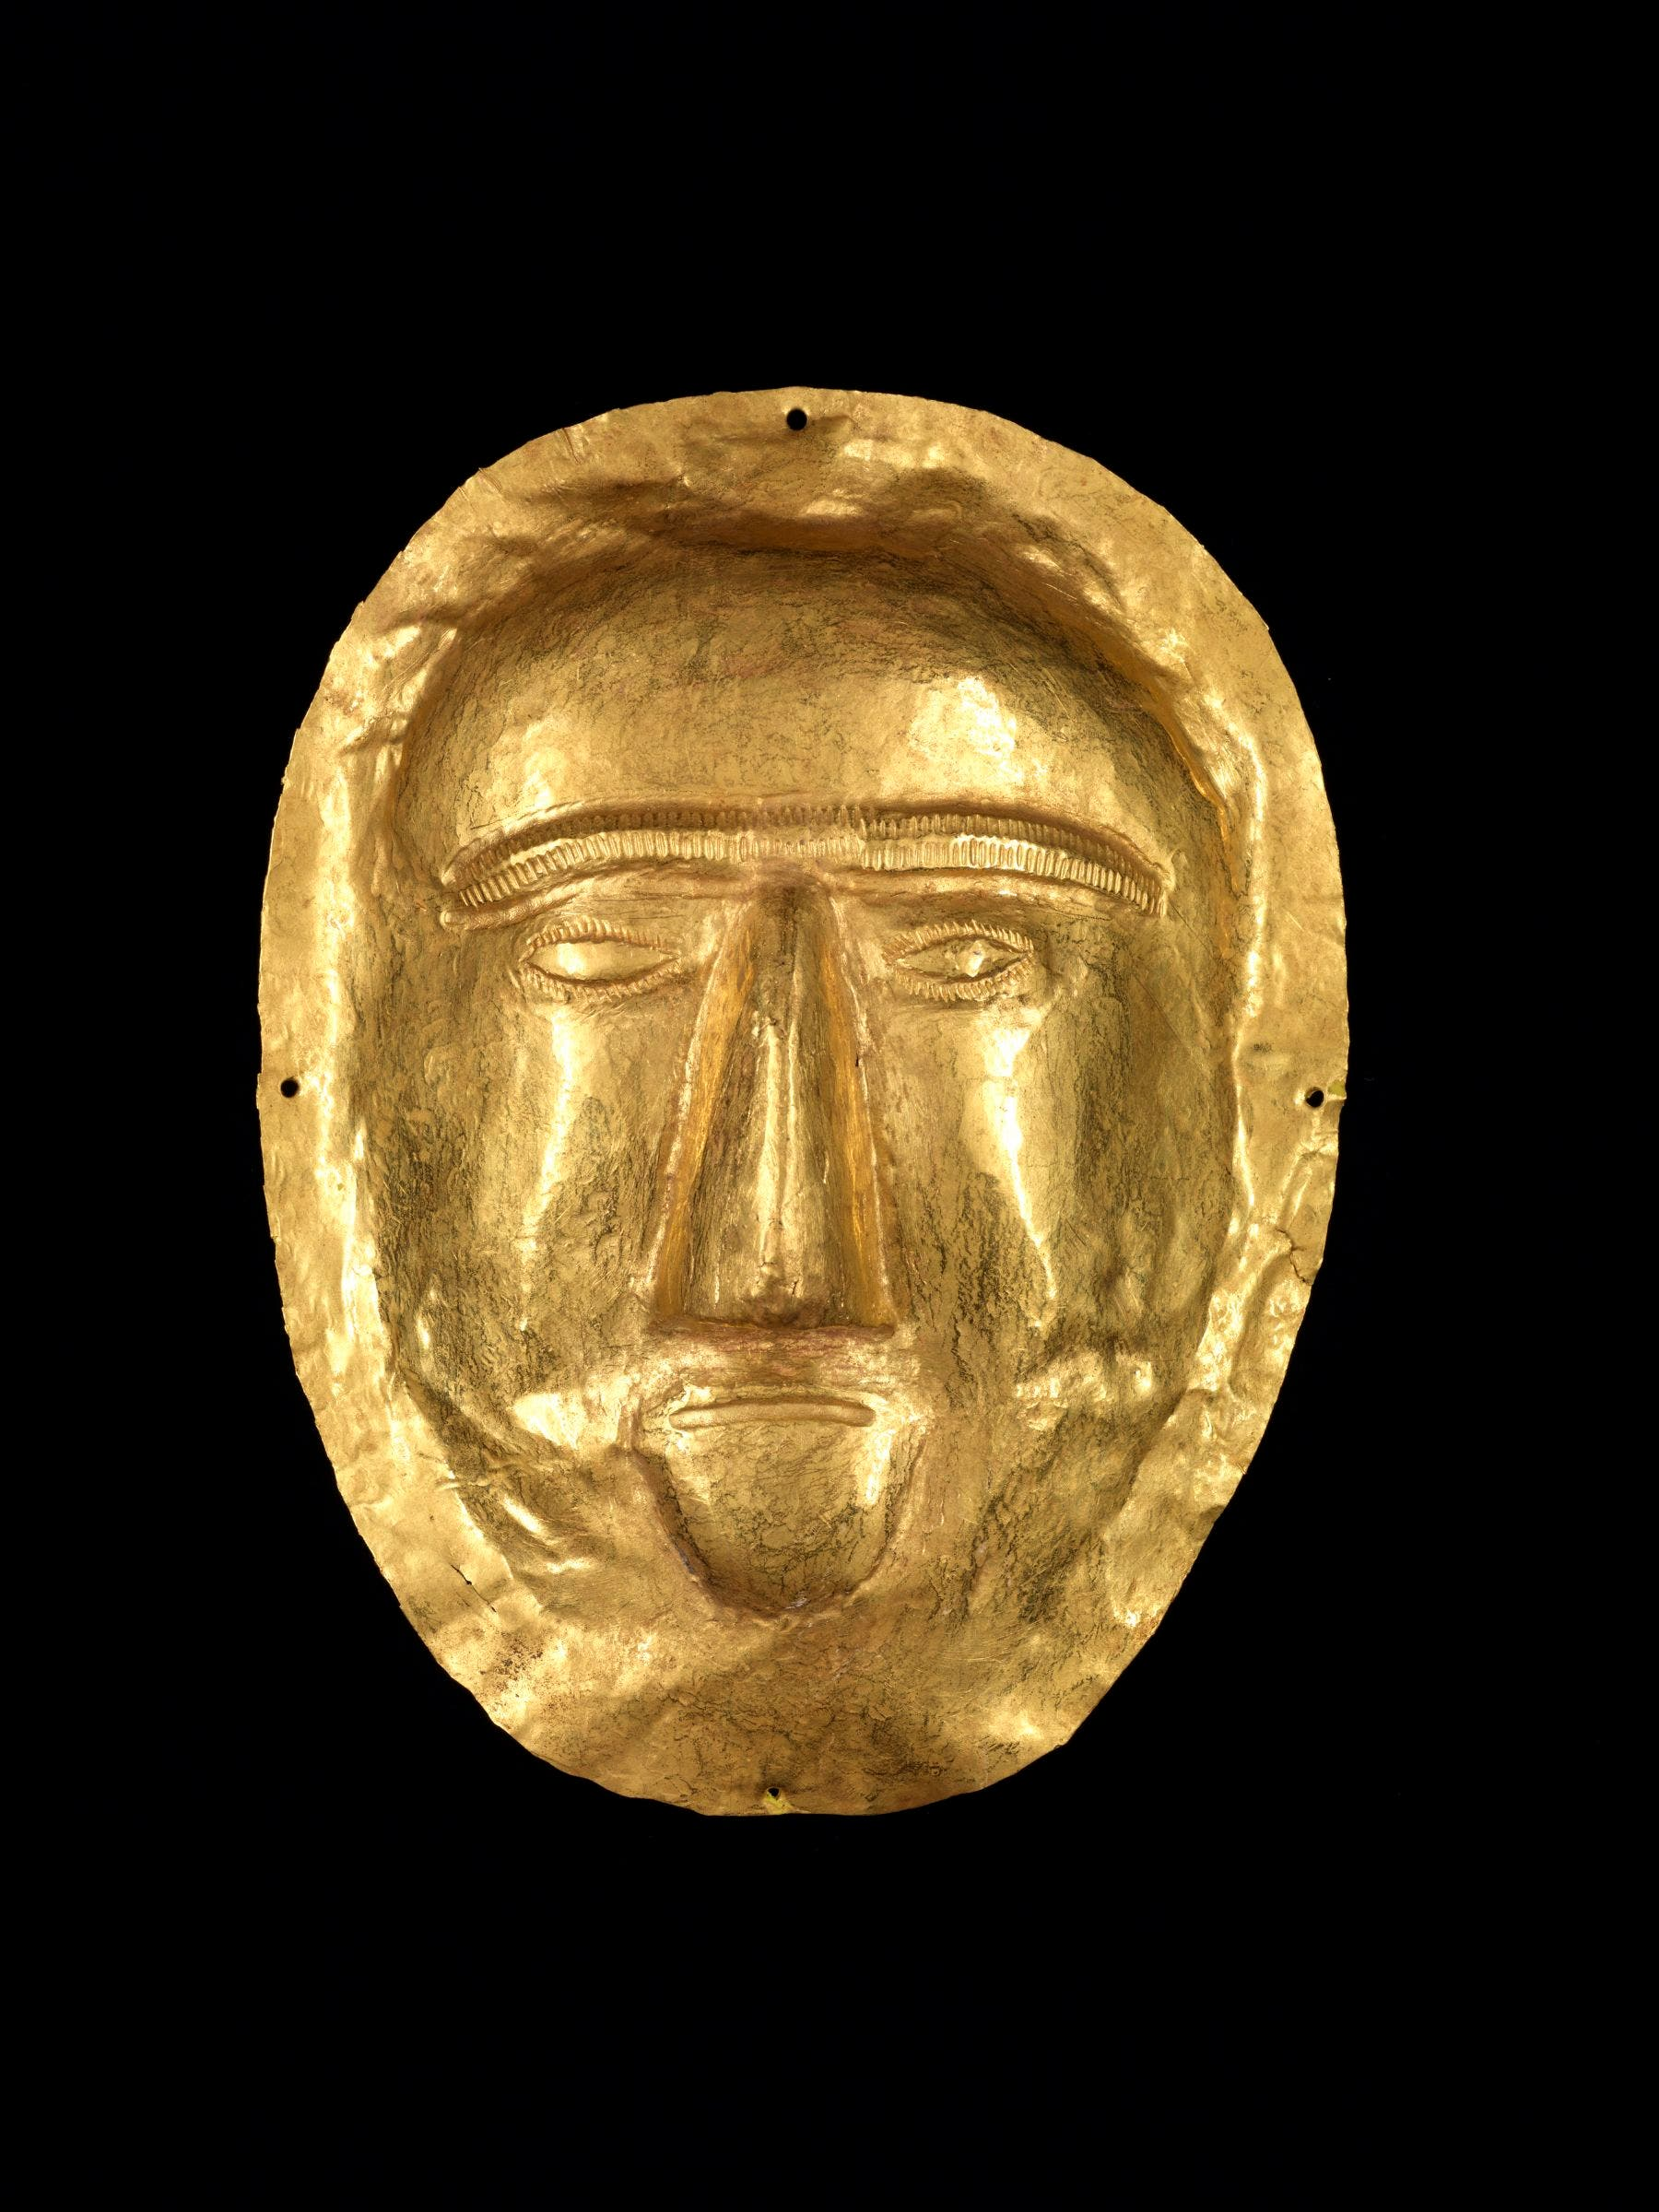 Funerary Mask, Thaj, Tell al-Zayer, Saudi Arabia, 1st century BC, gold, National Museum, Riyadh